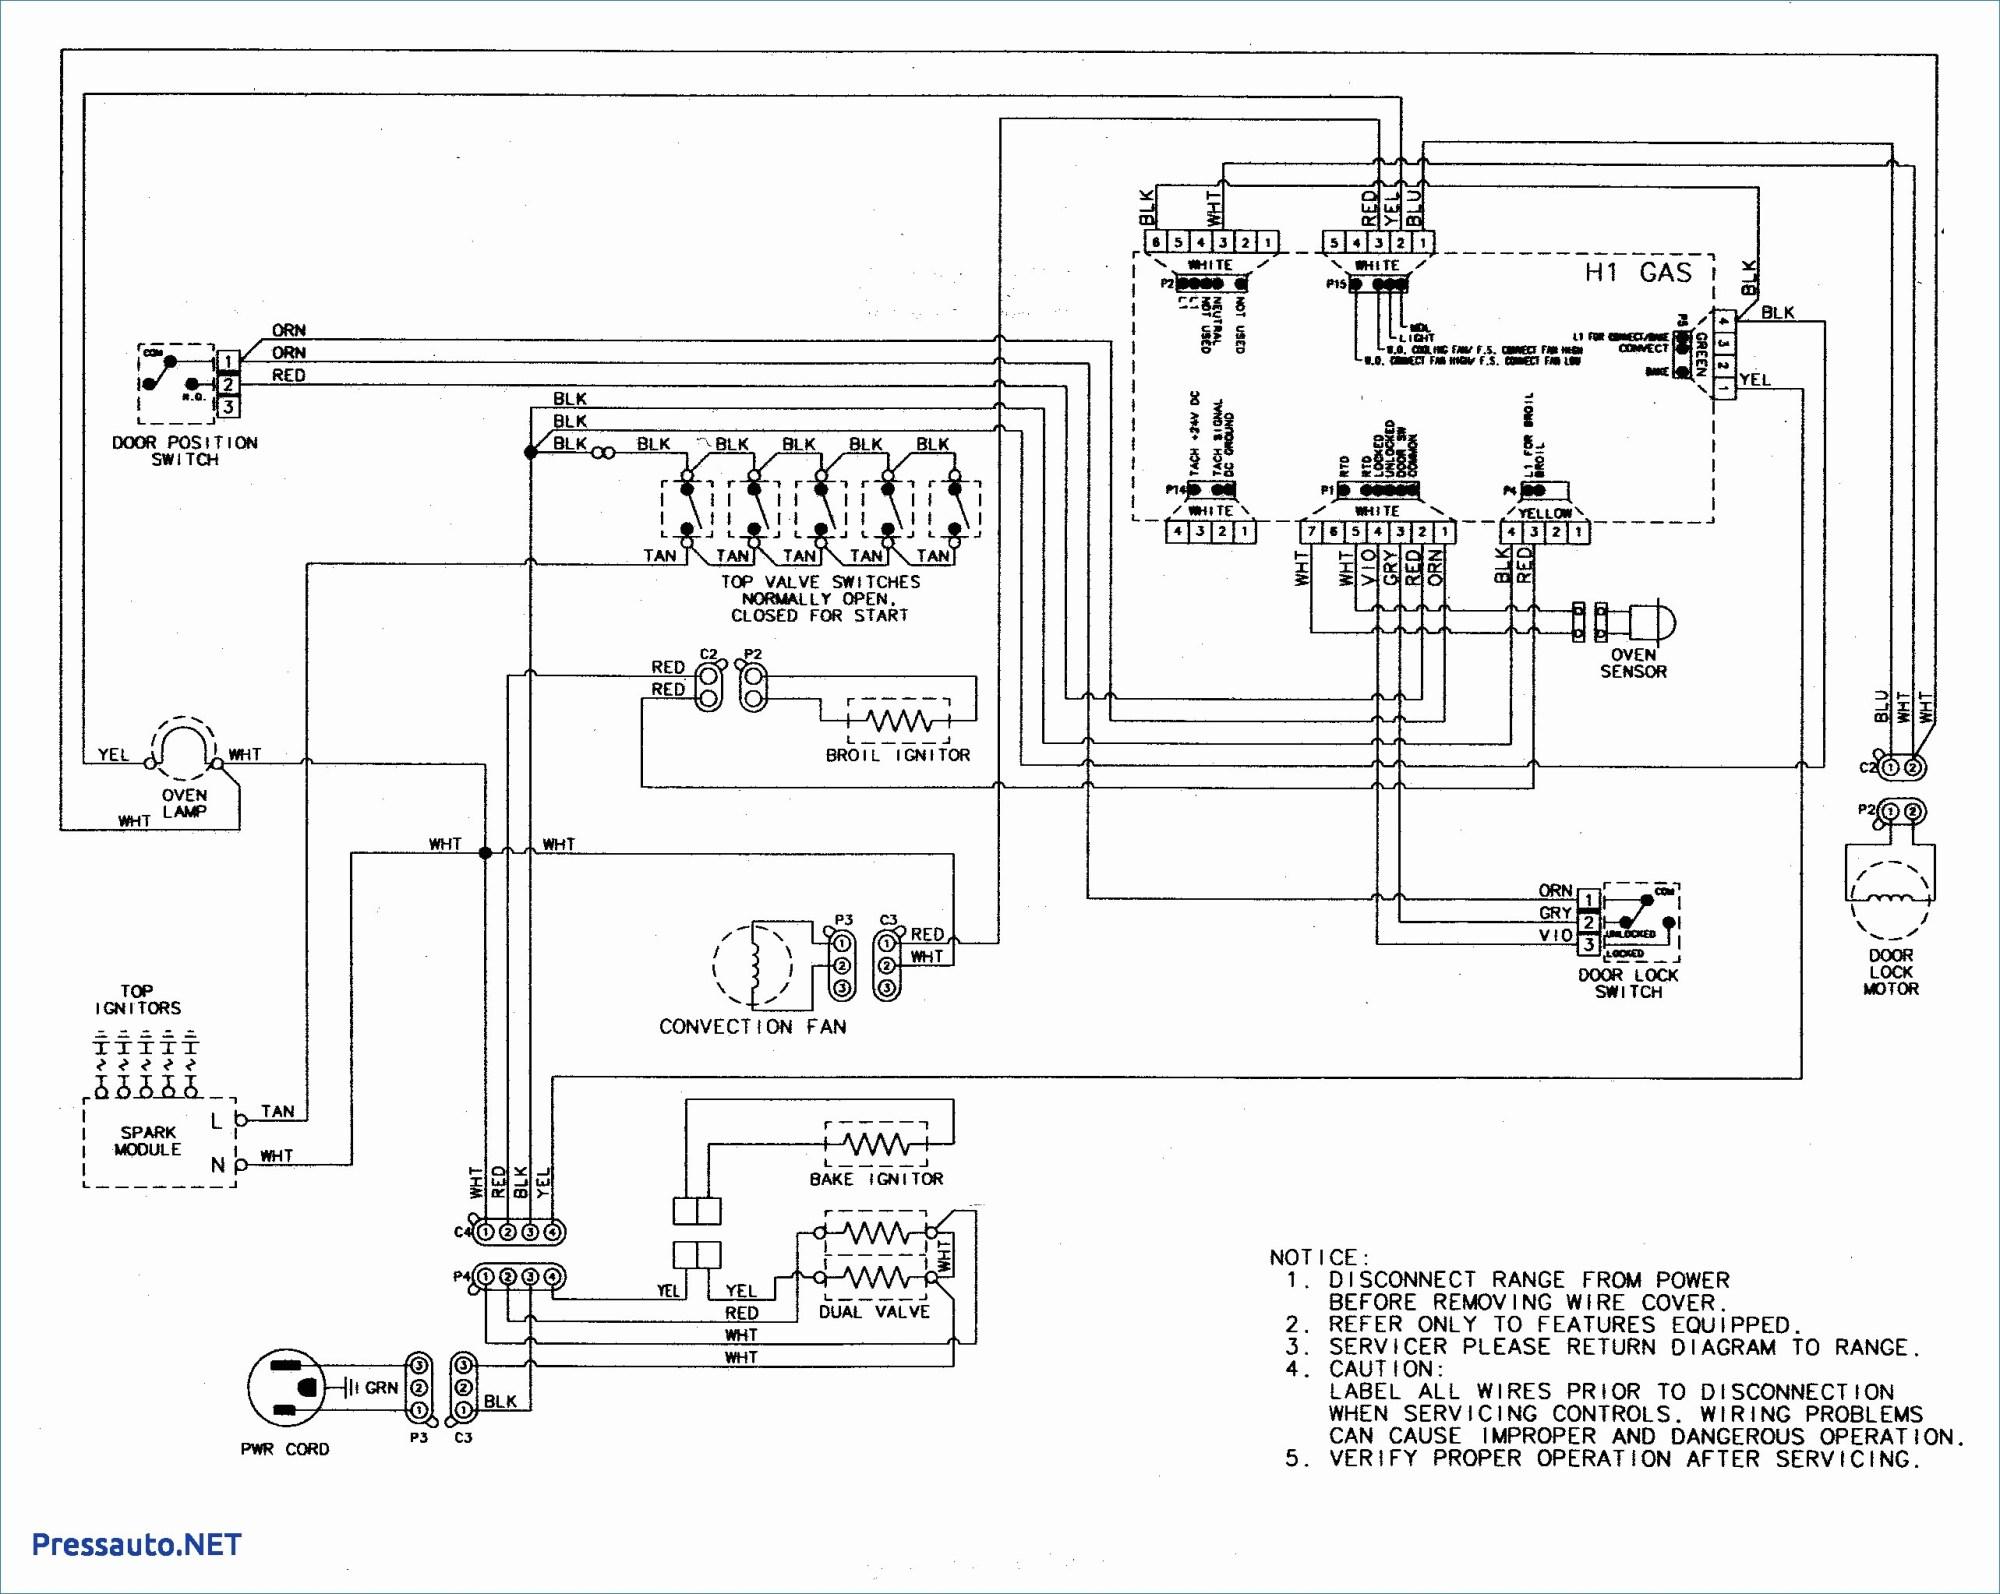 hight resolution of mitsubishi mini split wiring diagram wiring diagram for mitsubishi mini split new mitsubishi mini split